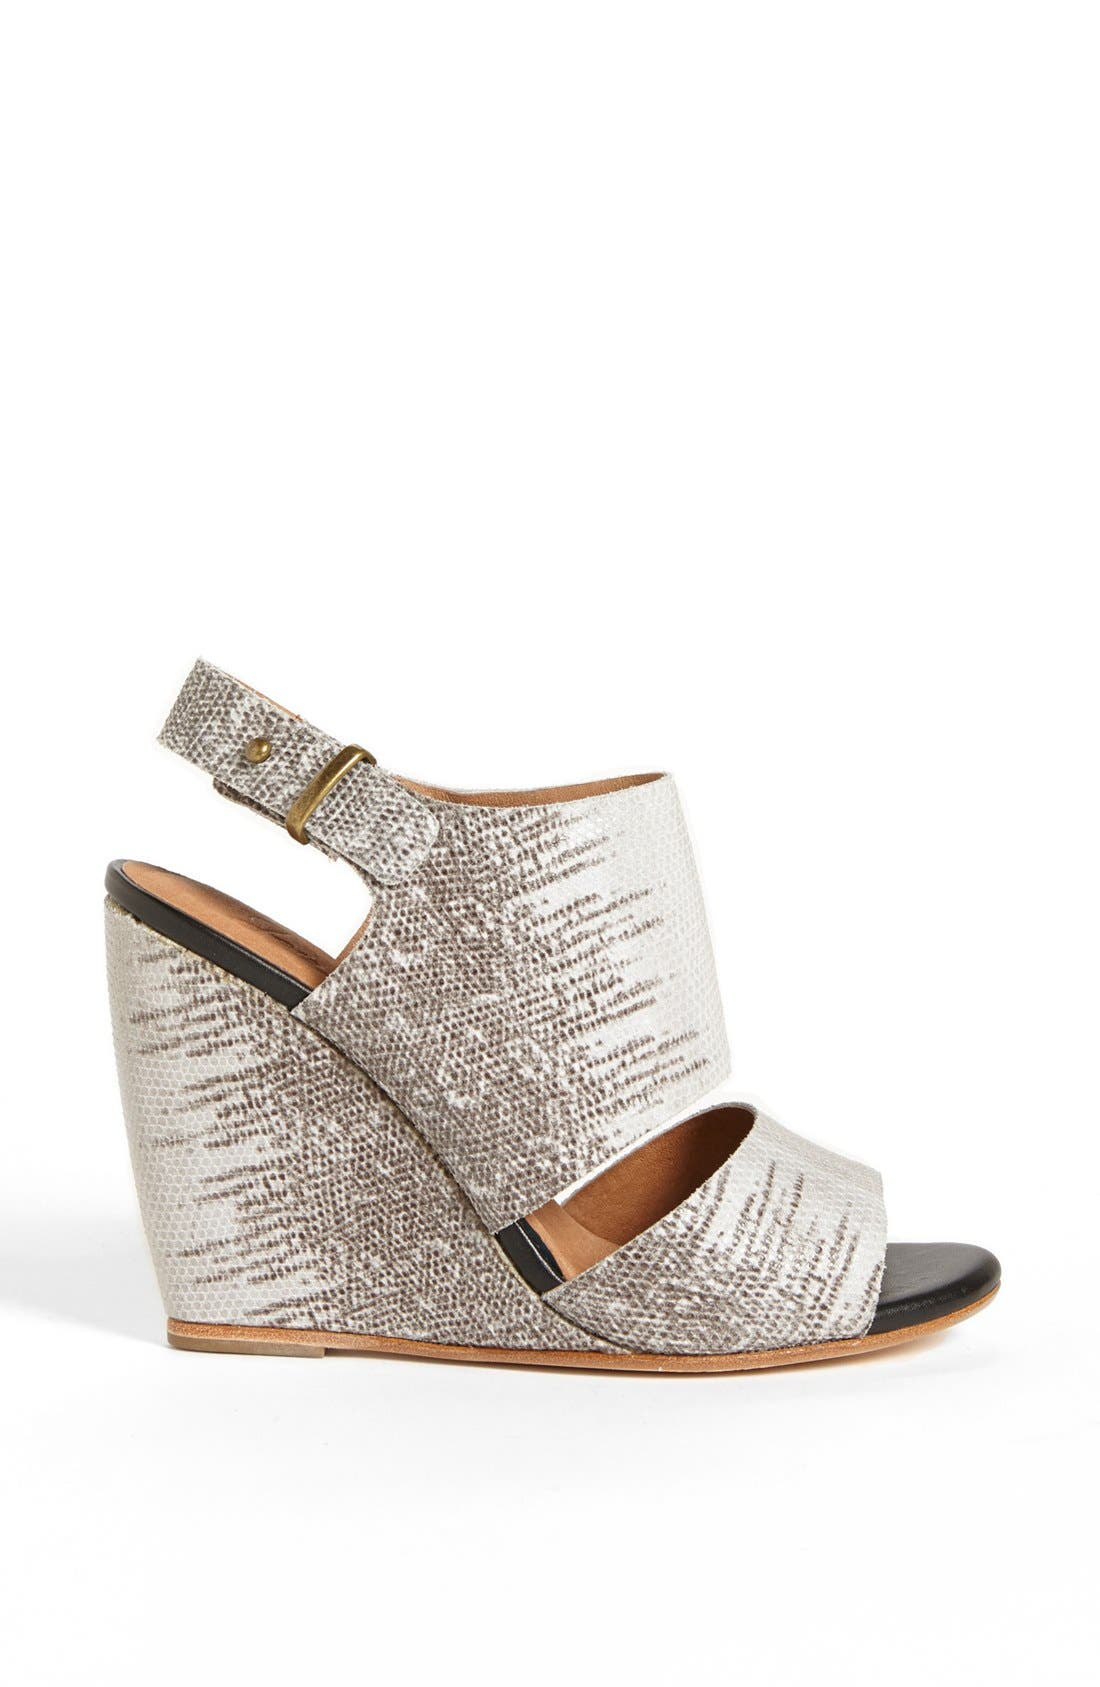 Alternate Image 3  - Joie 'Ashland' Wedge Sandal